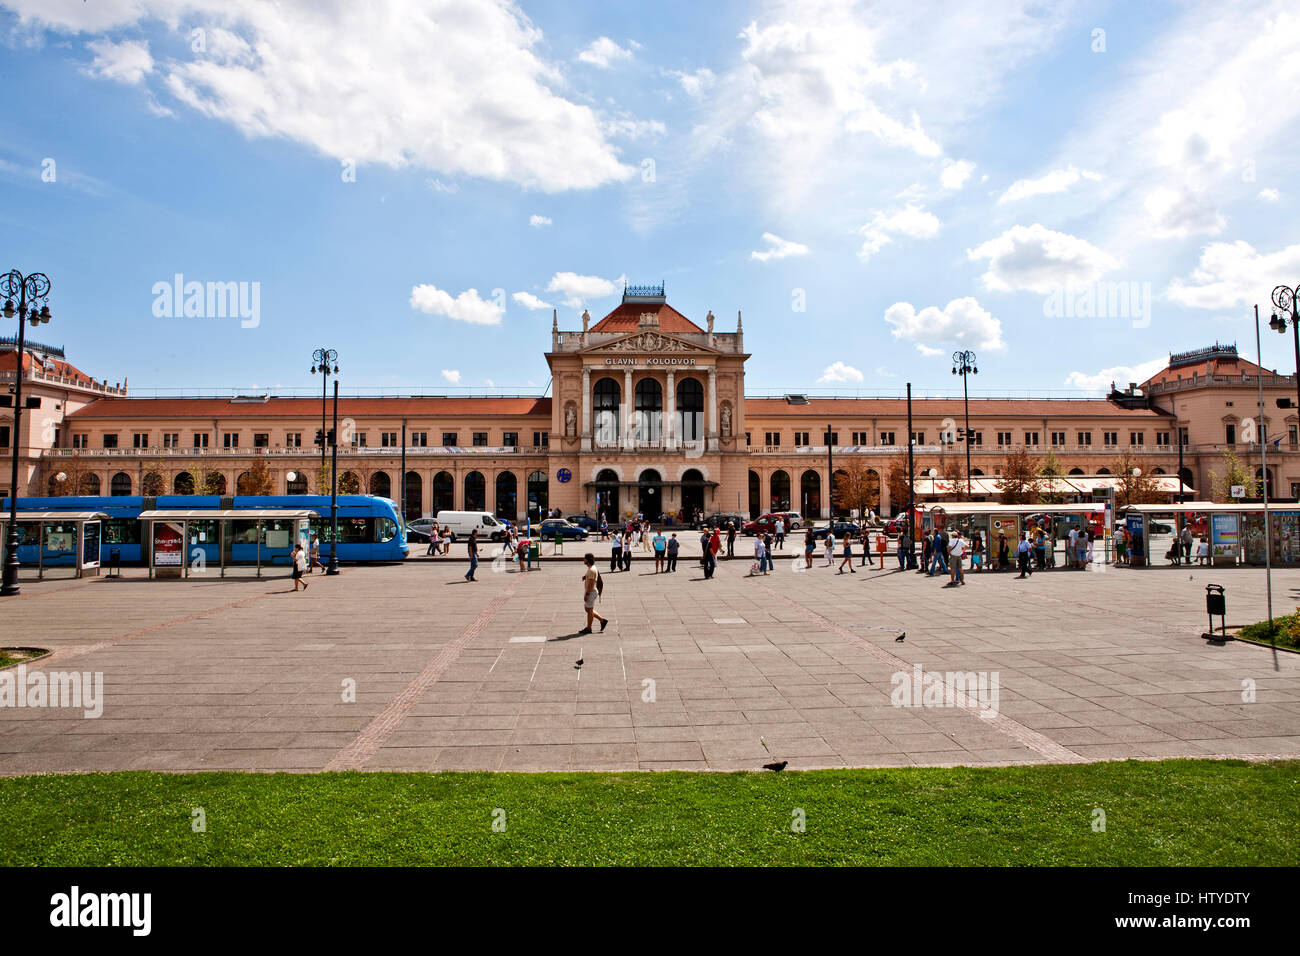 The Main Railway Station Glavni Kolodvor In Zagreb Croatia Stock Photo Alamy